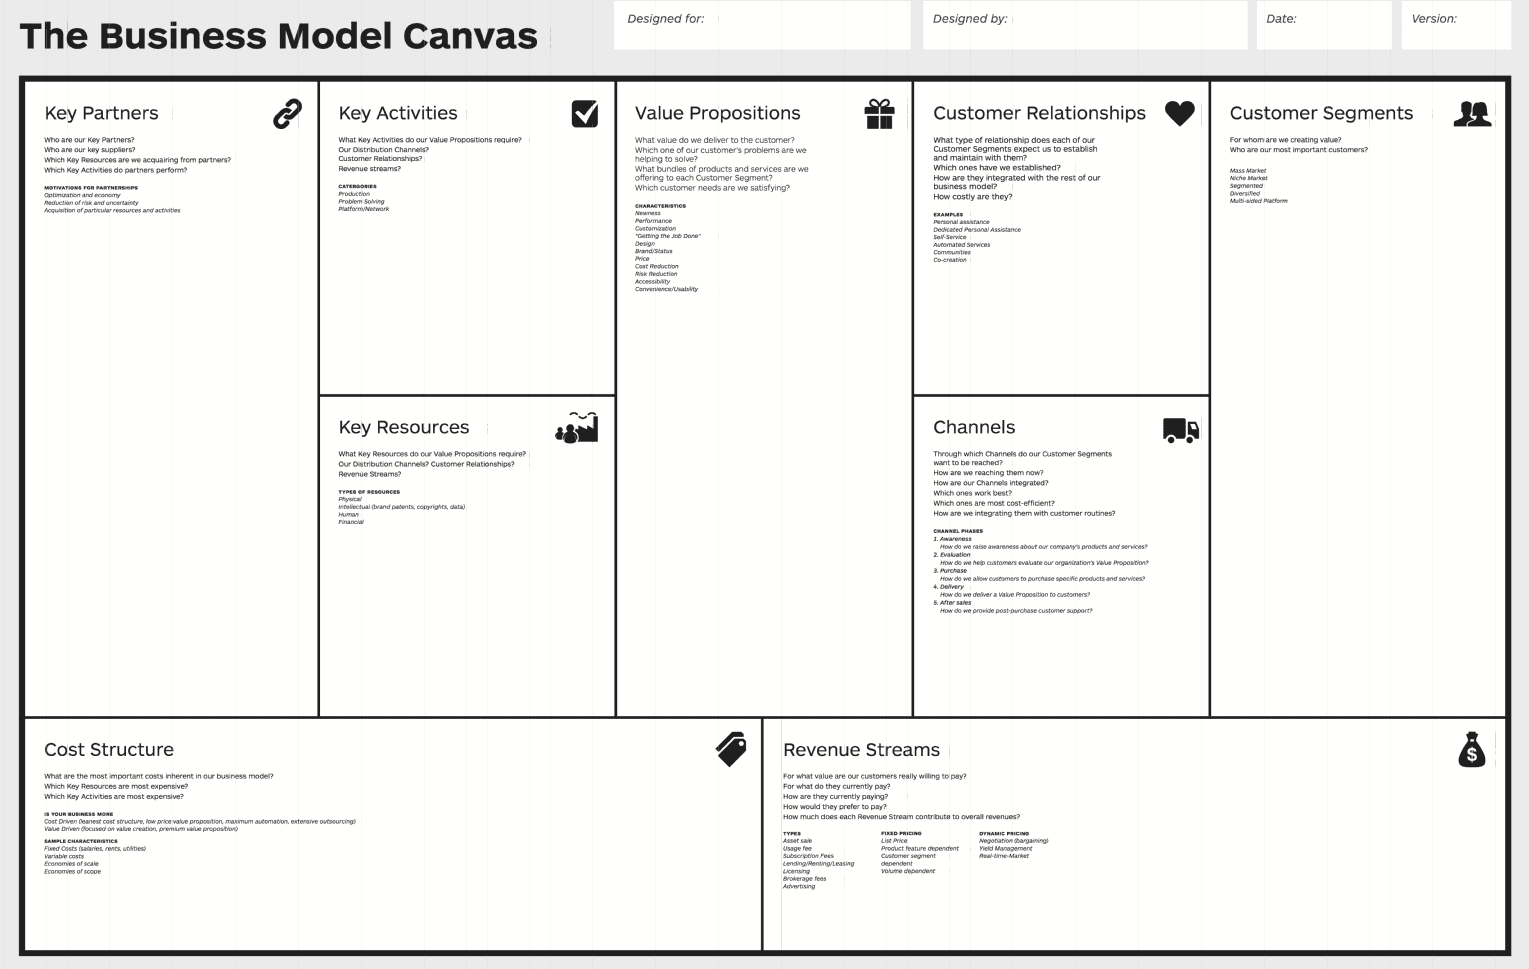 A business model canvas